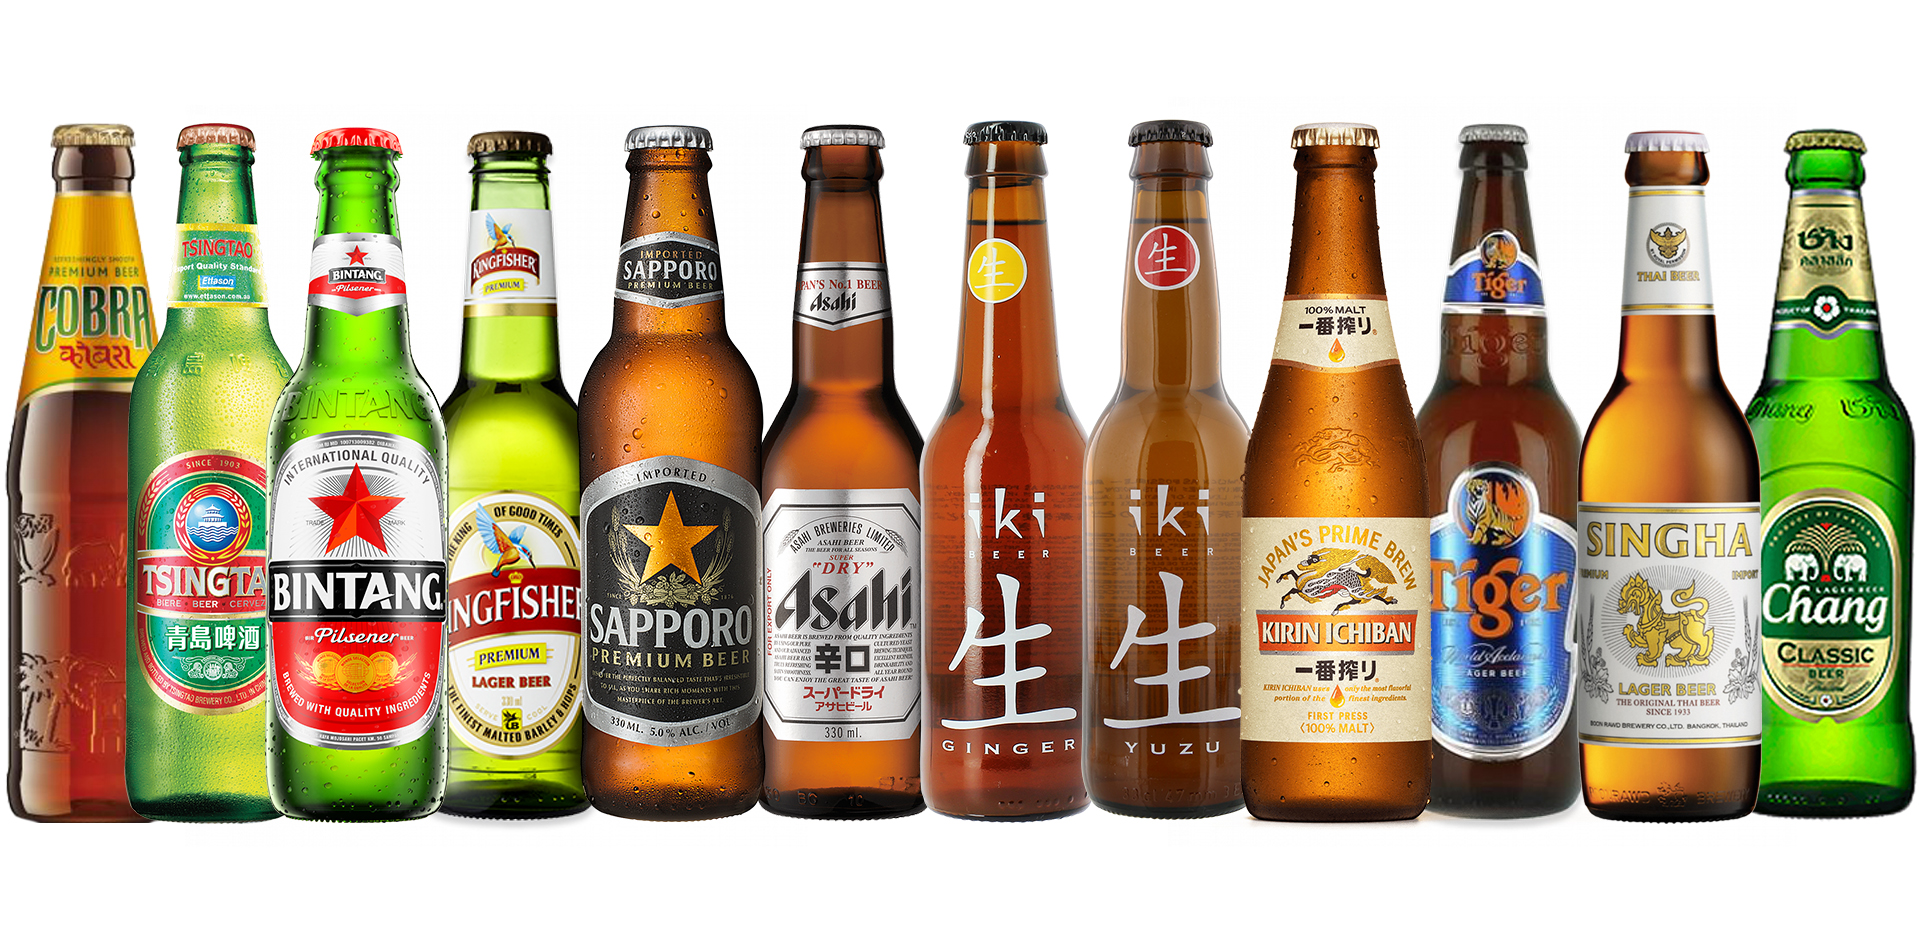 Nieuwsbrief-Nectar-Utrecht-Aziatische bieren-02